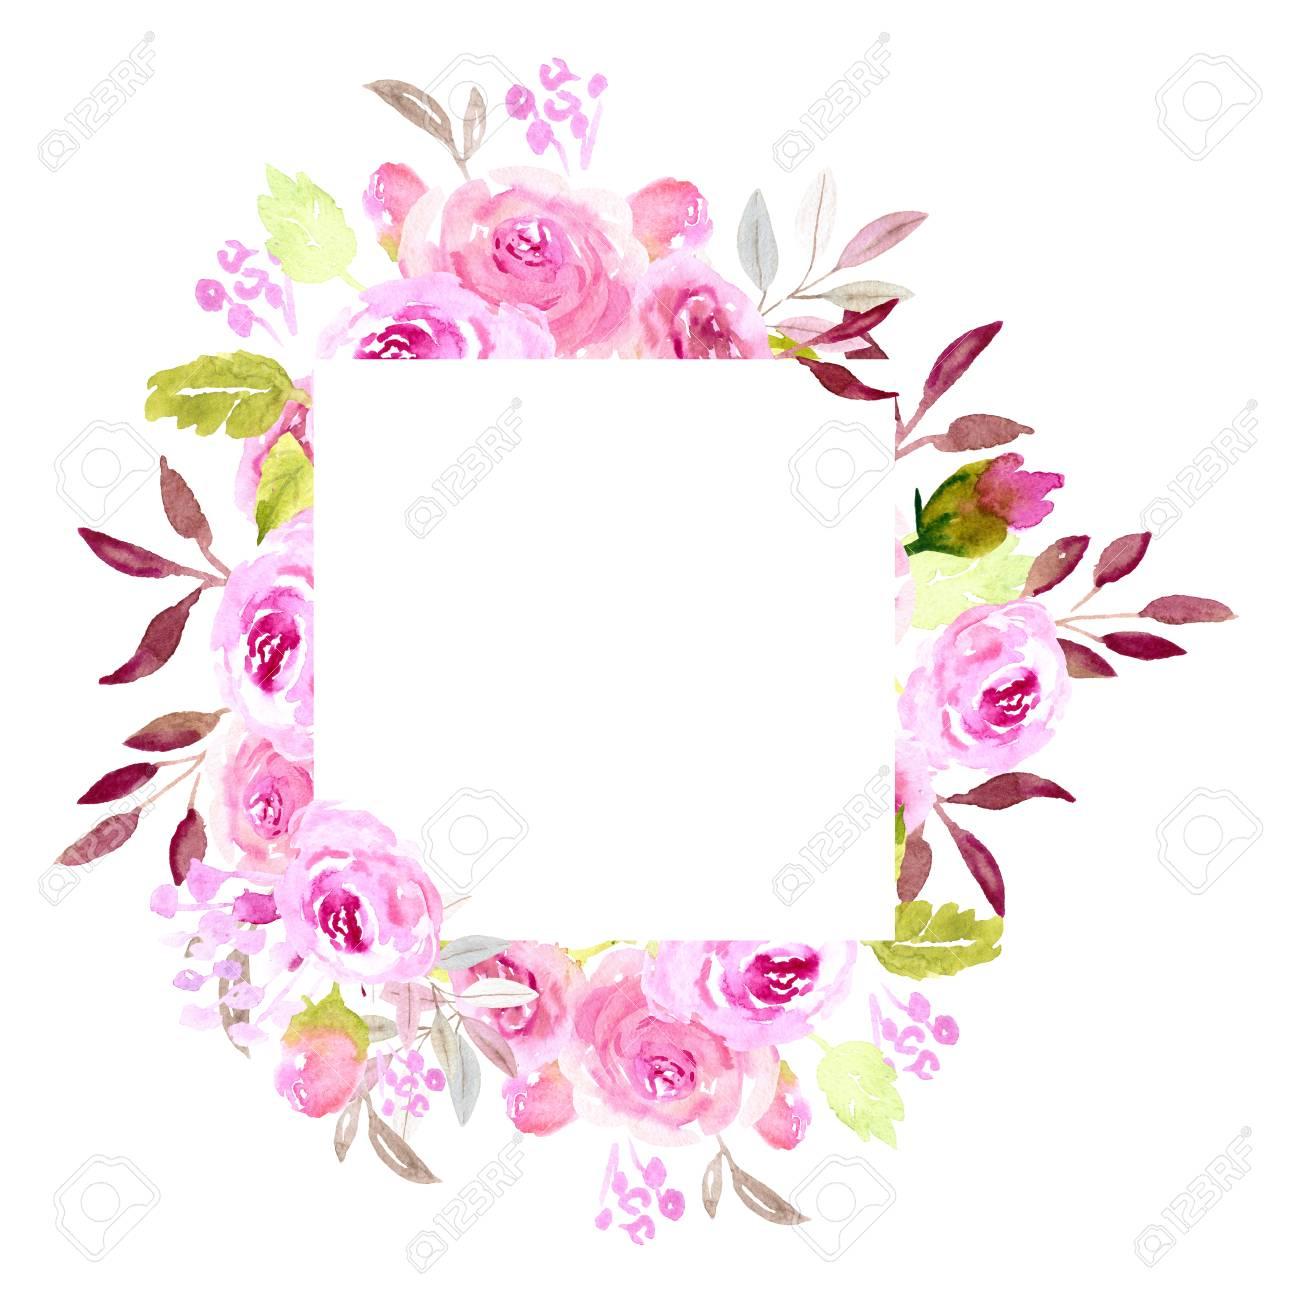 PAINTING ILLUSTRATION FLOWERS PETALS PINK SOFT PRETTY FRAMED ART PRINT B12X12927